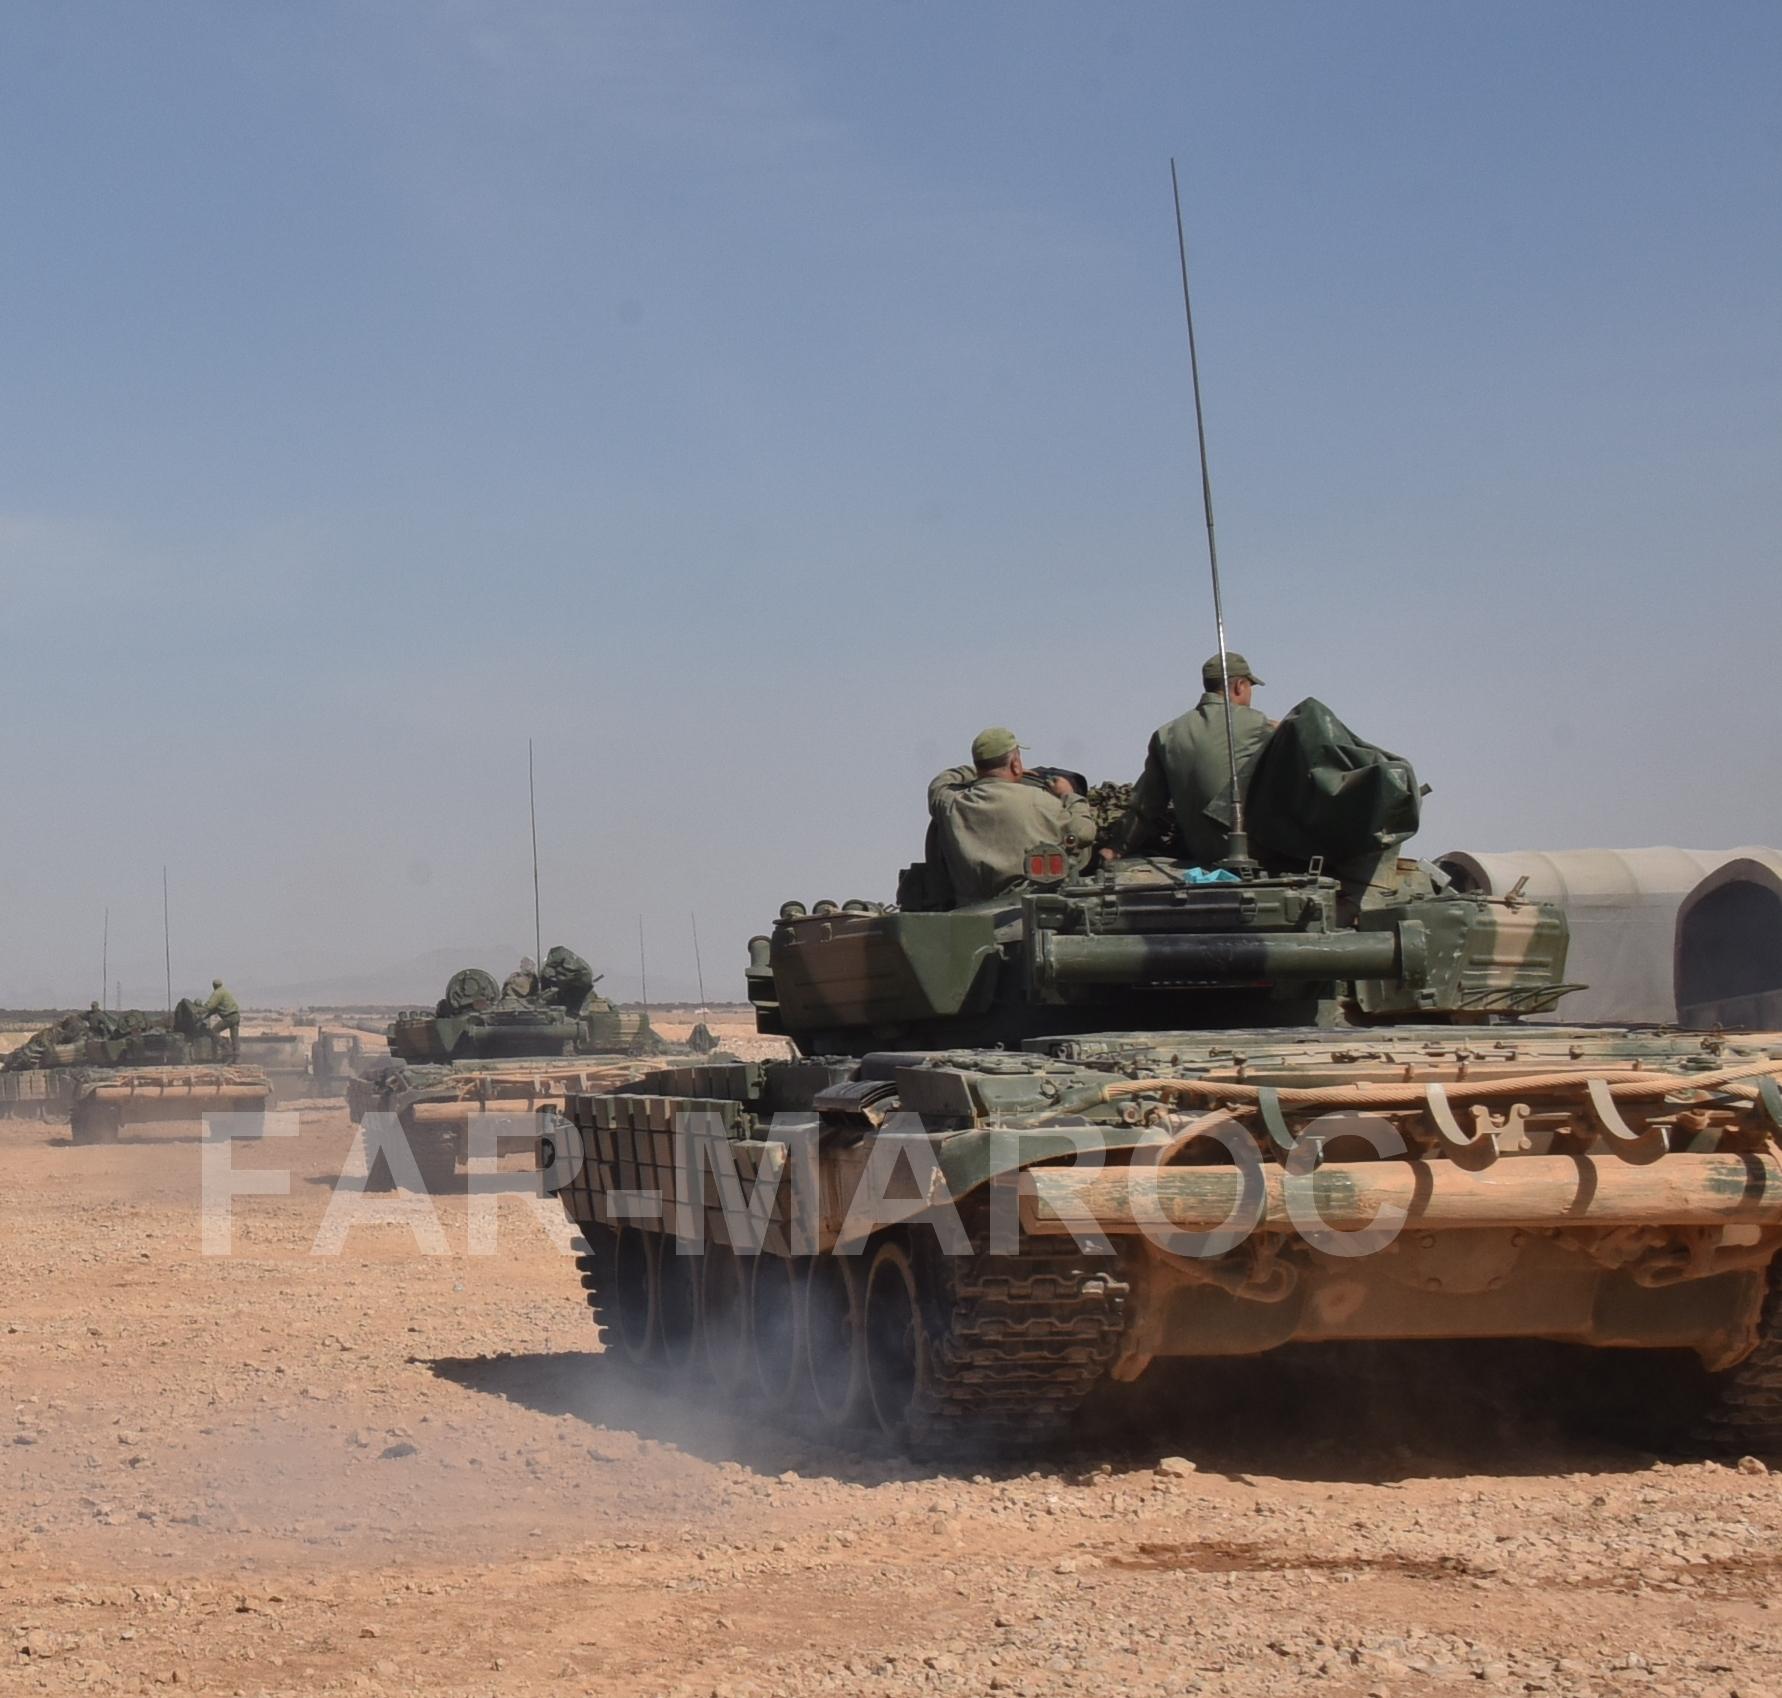 Chars T-72B/BK MArocains // Moroccan Army T-72B/BK Tanks - Page 6 49275813147_5ebdd5dac5_o